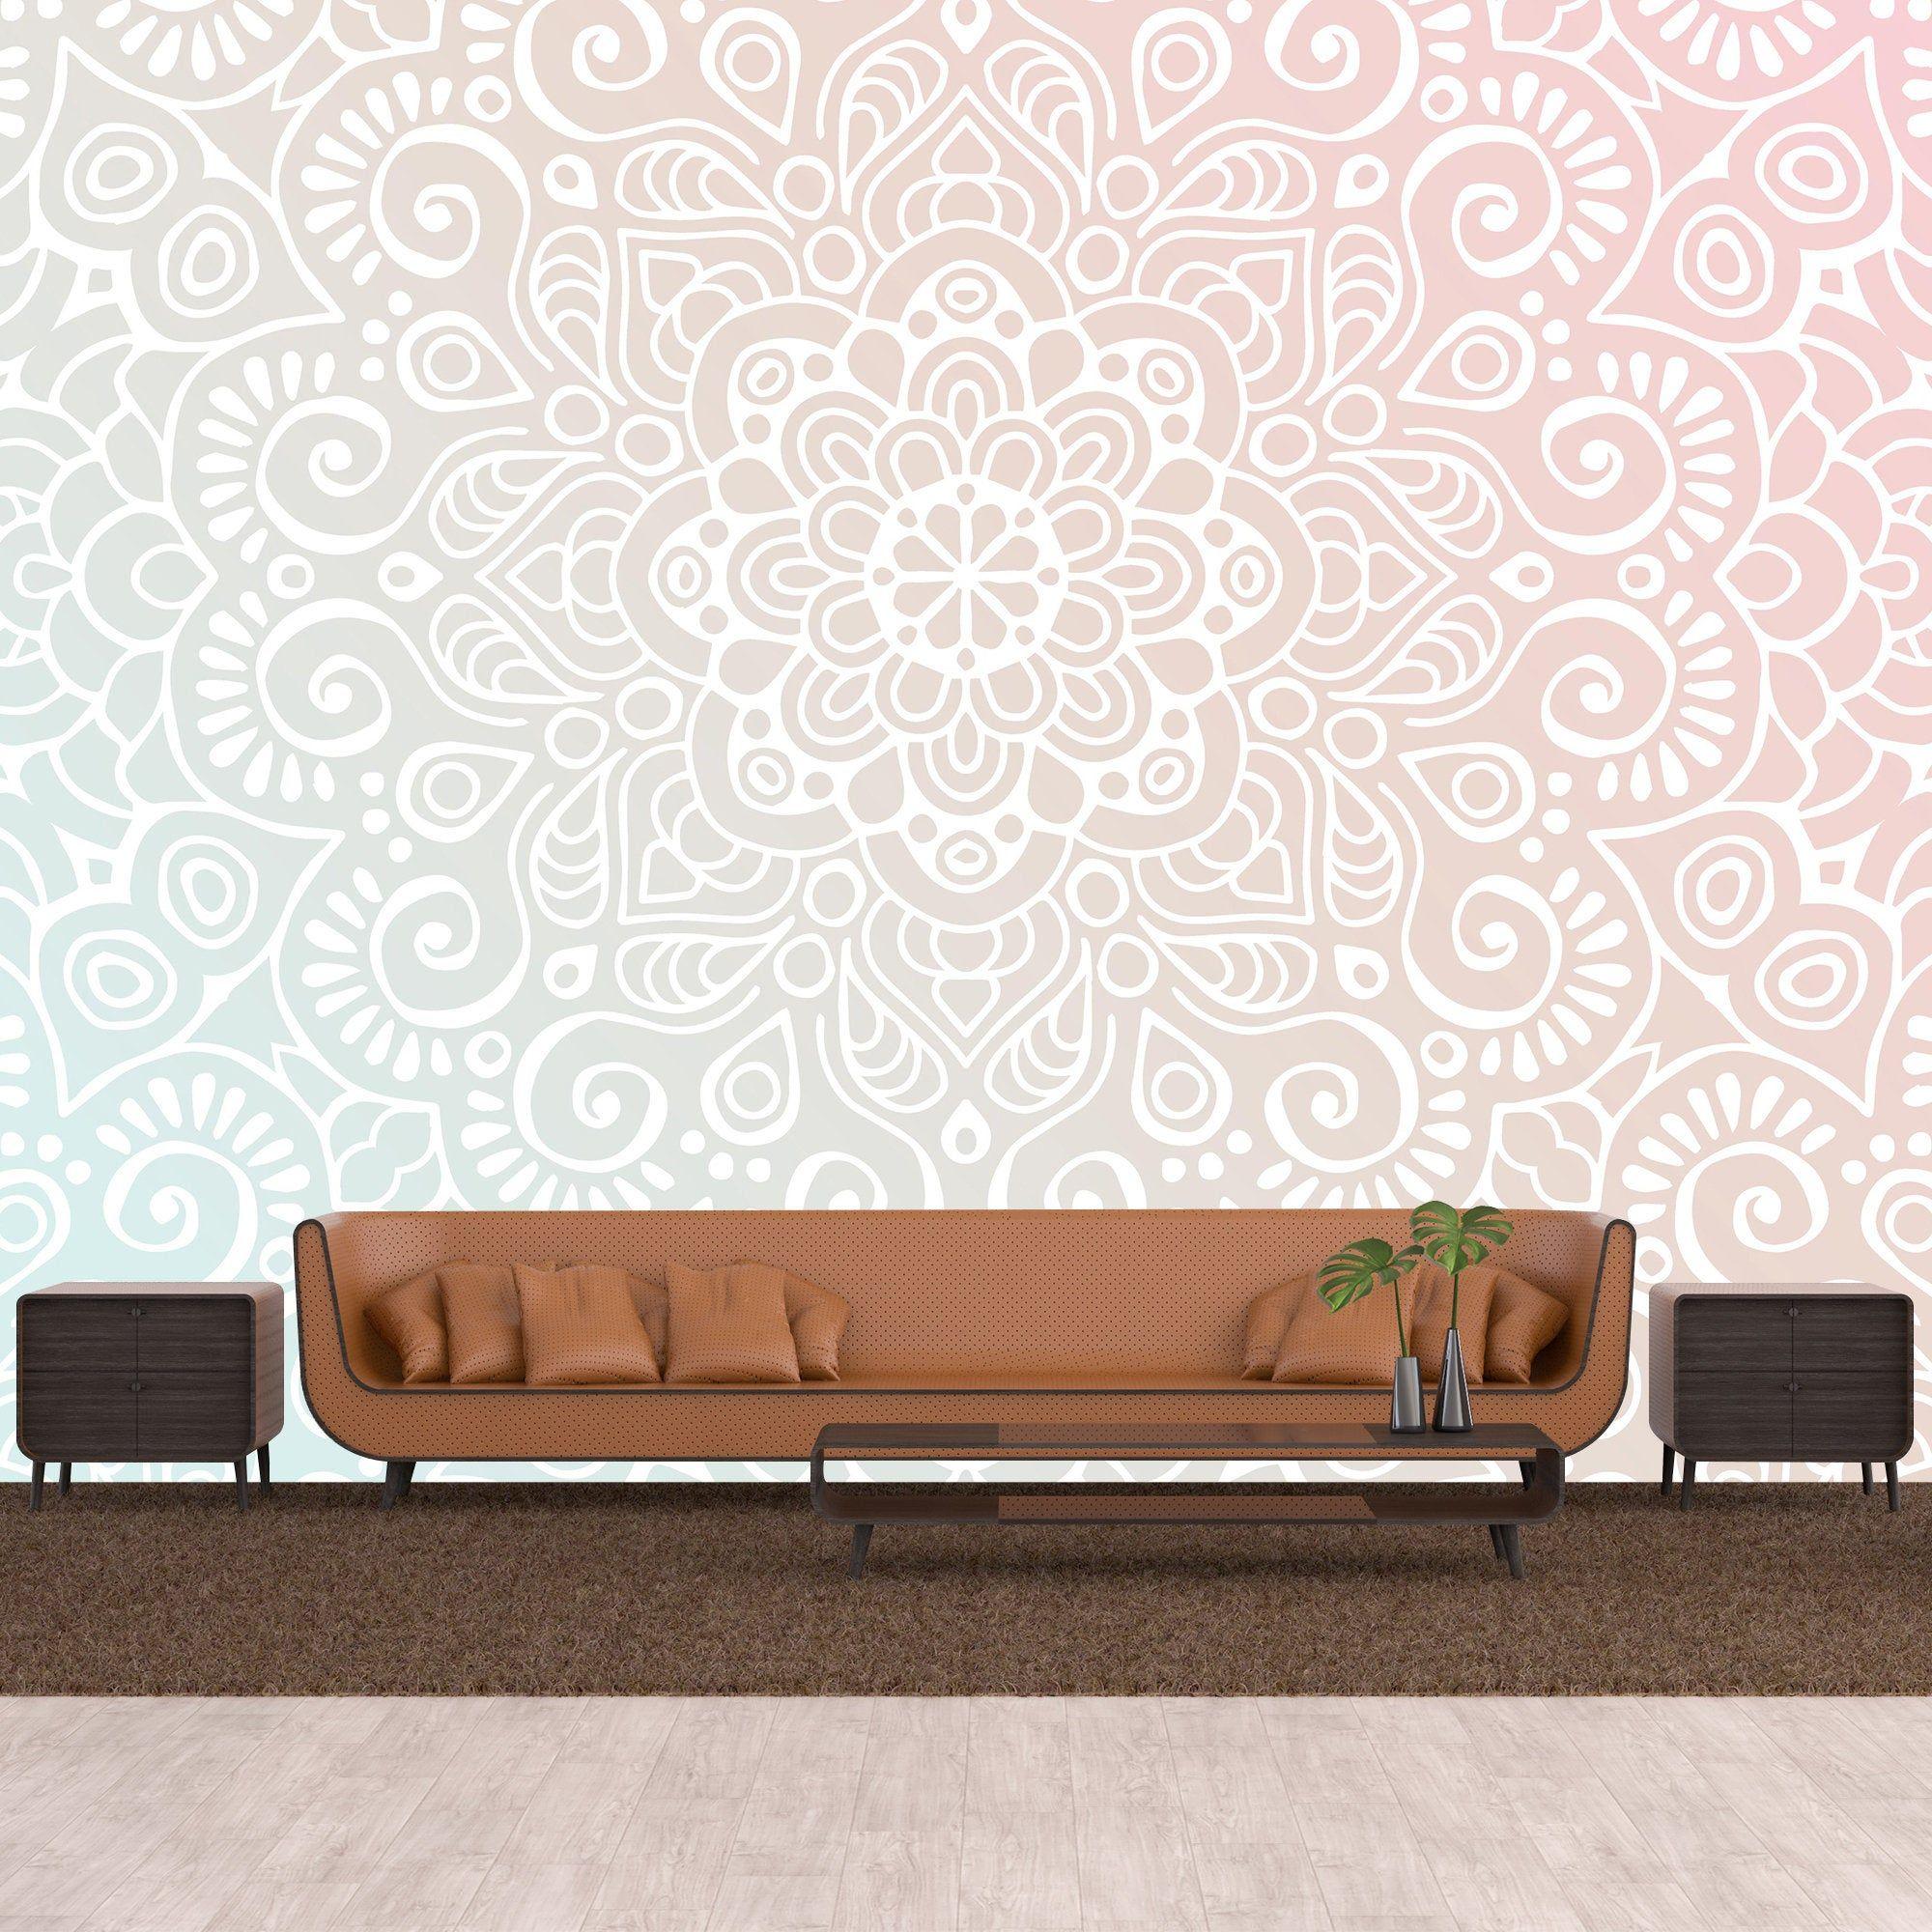 Mandala Removable Wallpaper Personalize Print Medallion Etsy Removable Wallpaper Mandala Wallpaper Smooth Walls